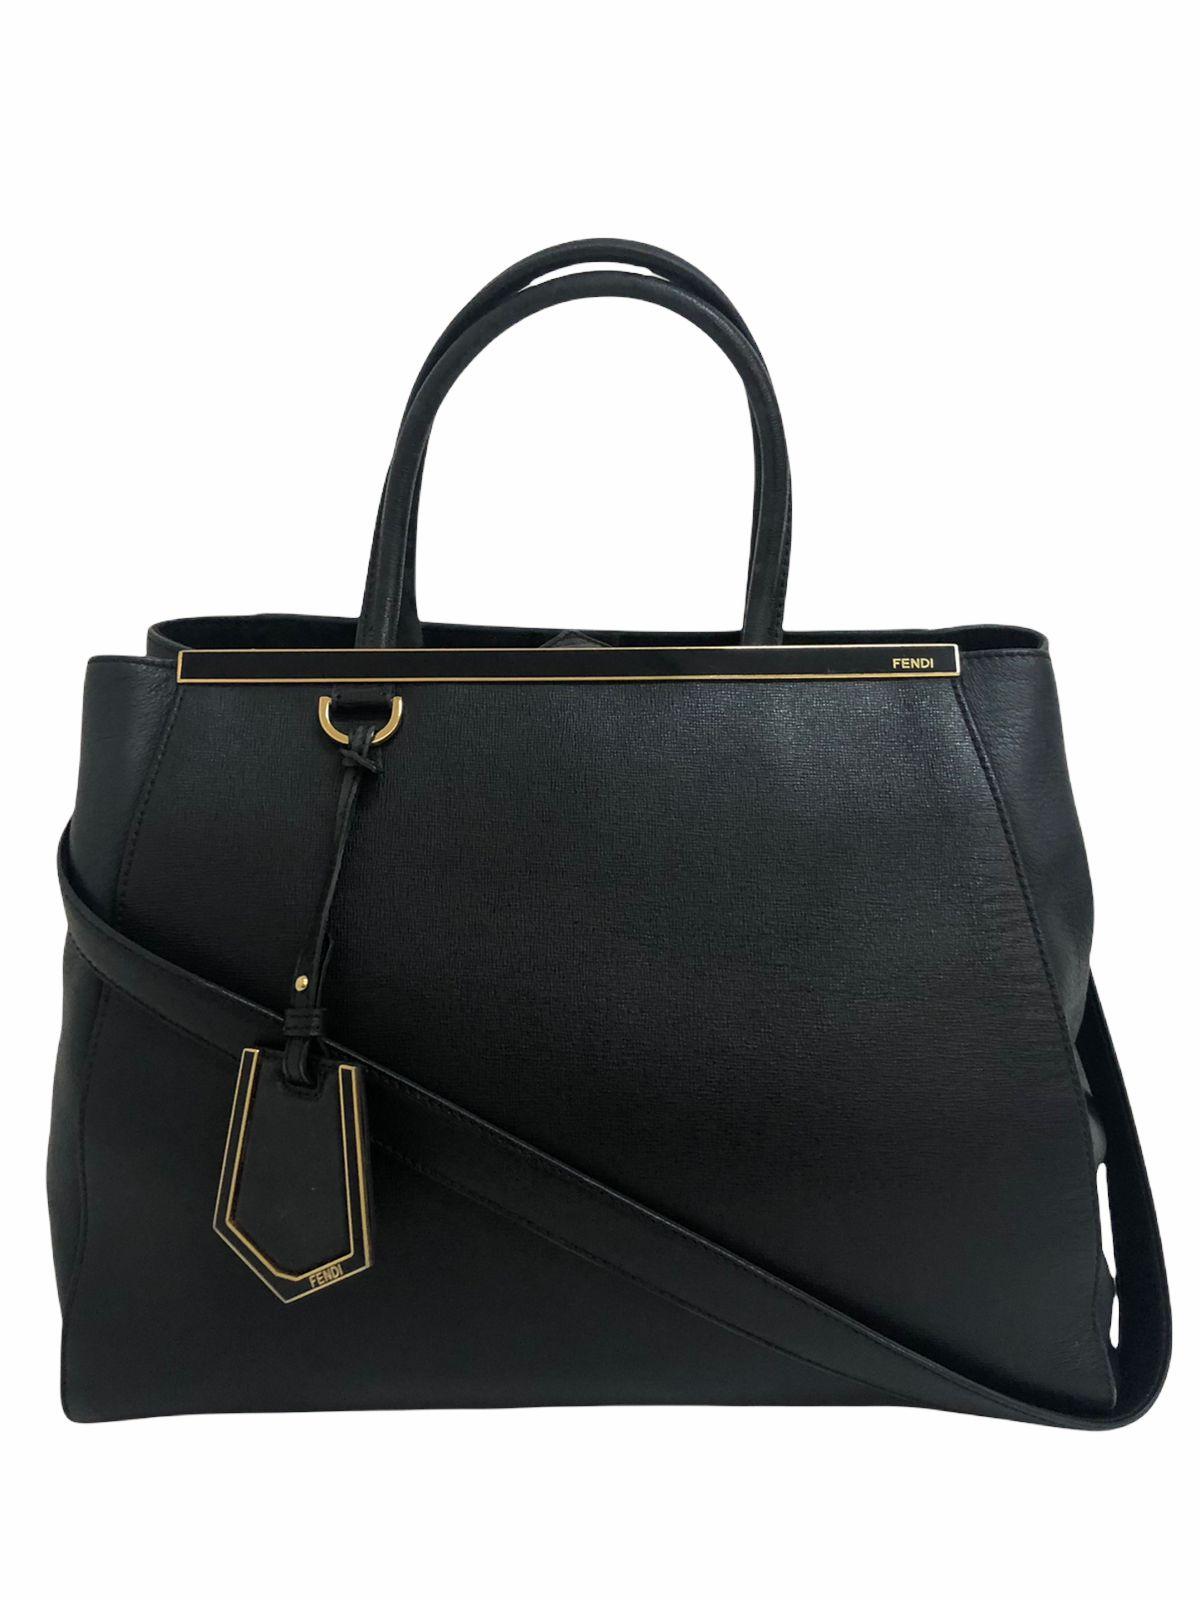 Bolsa Fendi 2Jours Leather Medium Preta